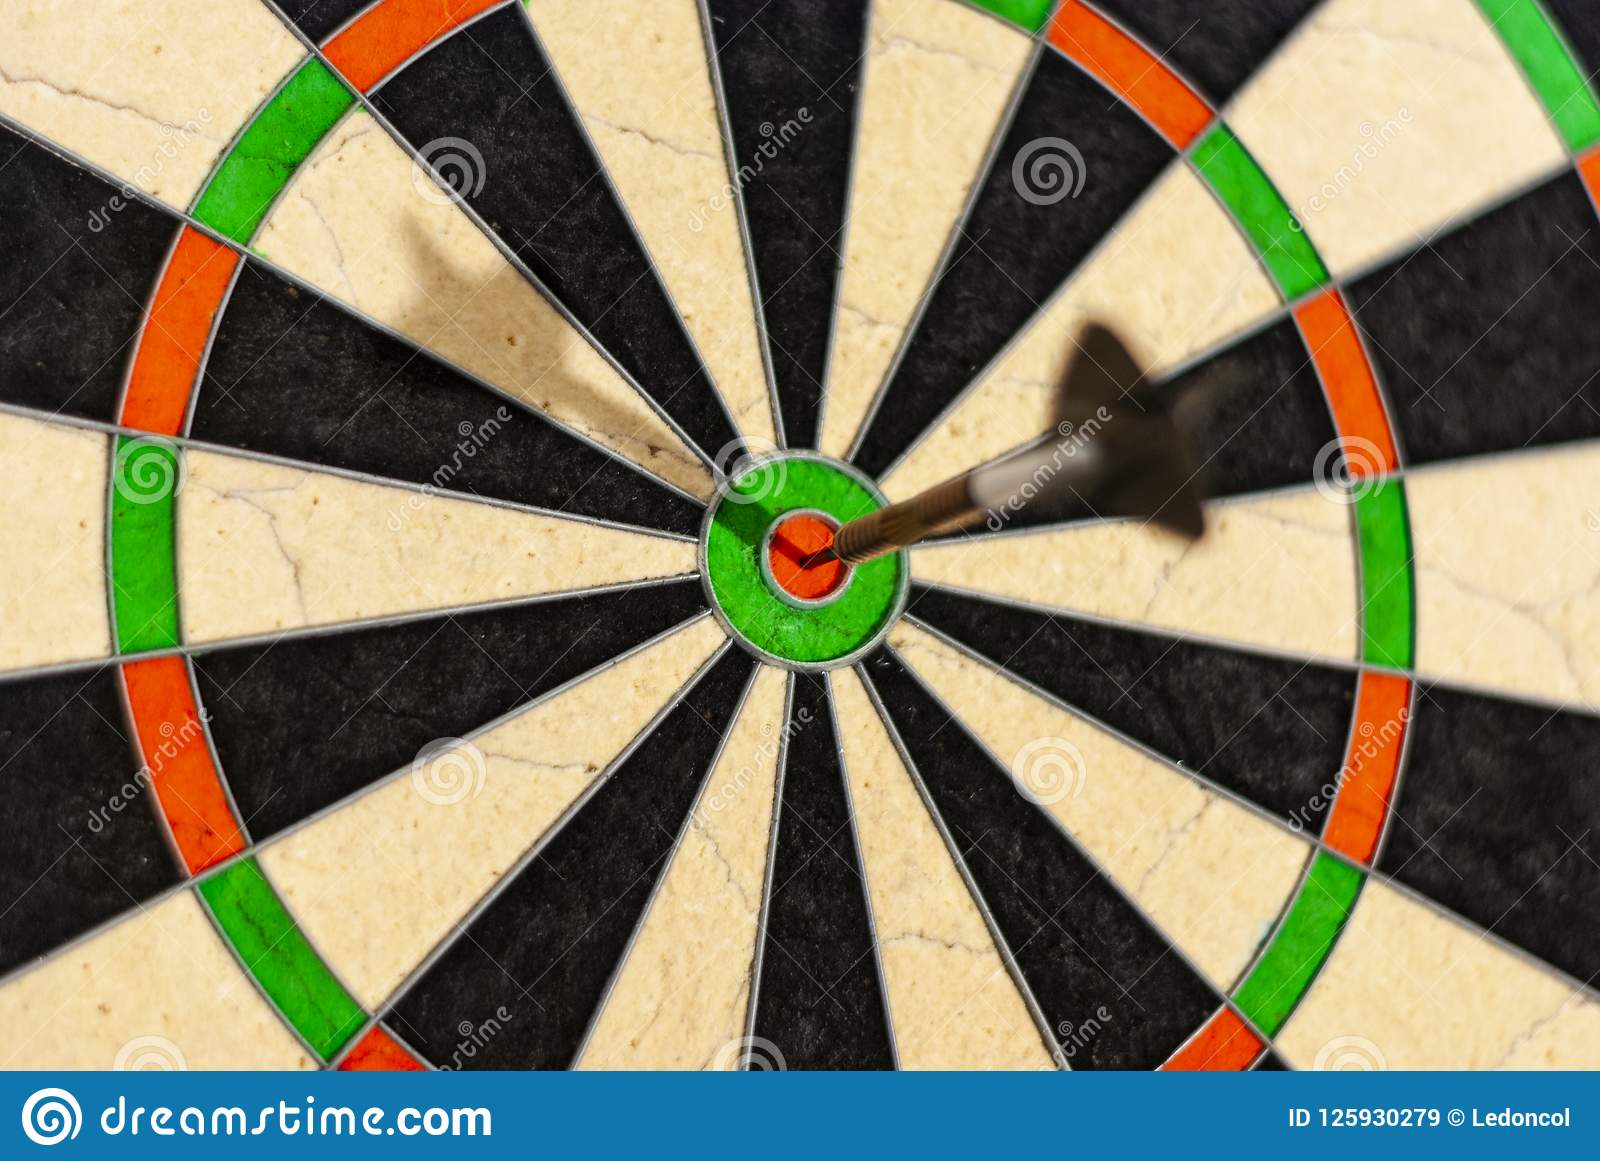 Darts And Dartboard In Dartbox Stock Image - Image of goal ...